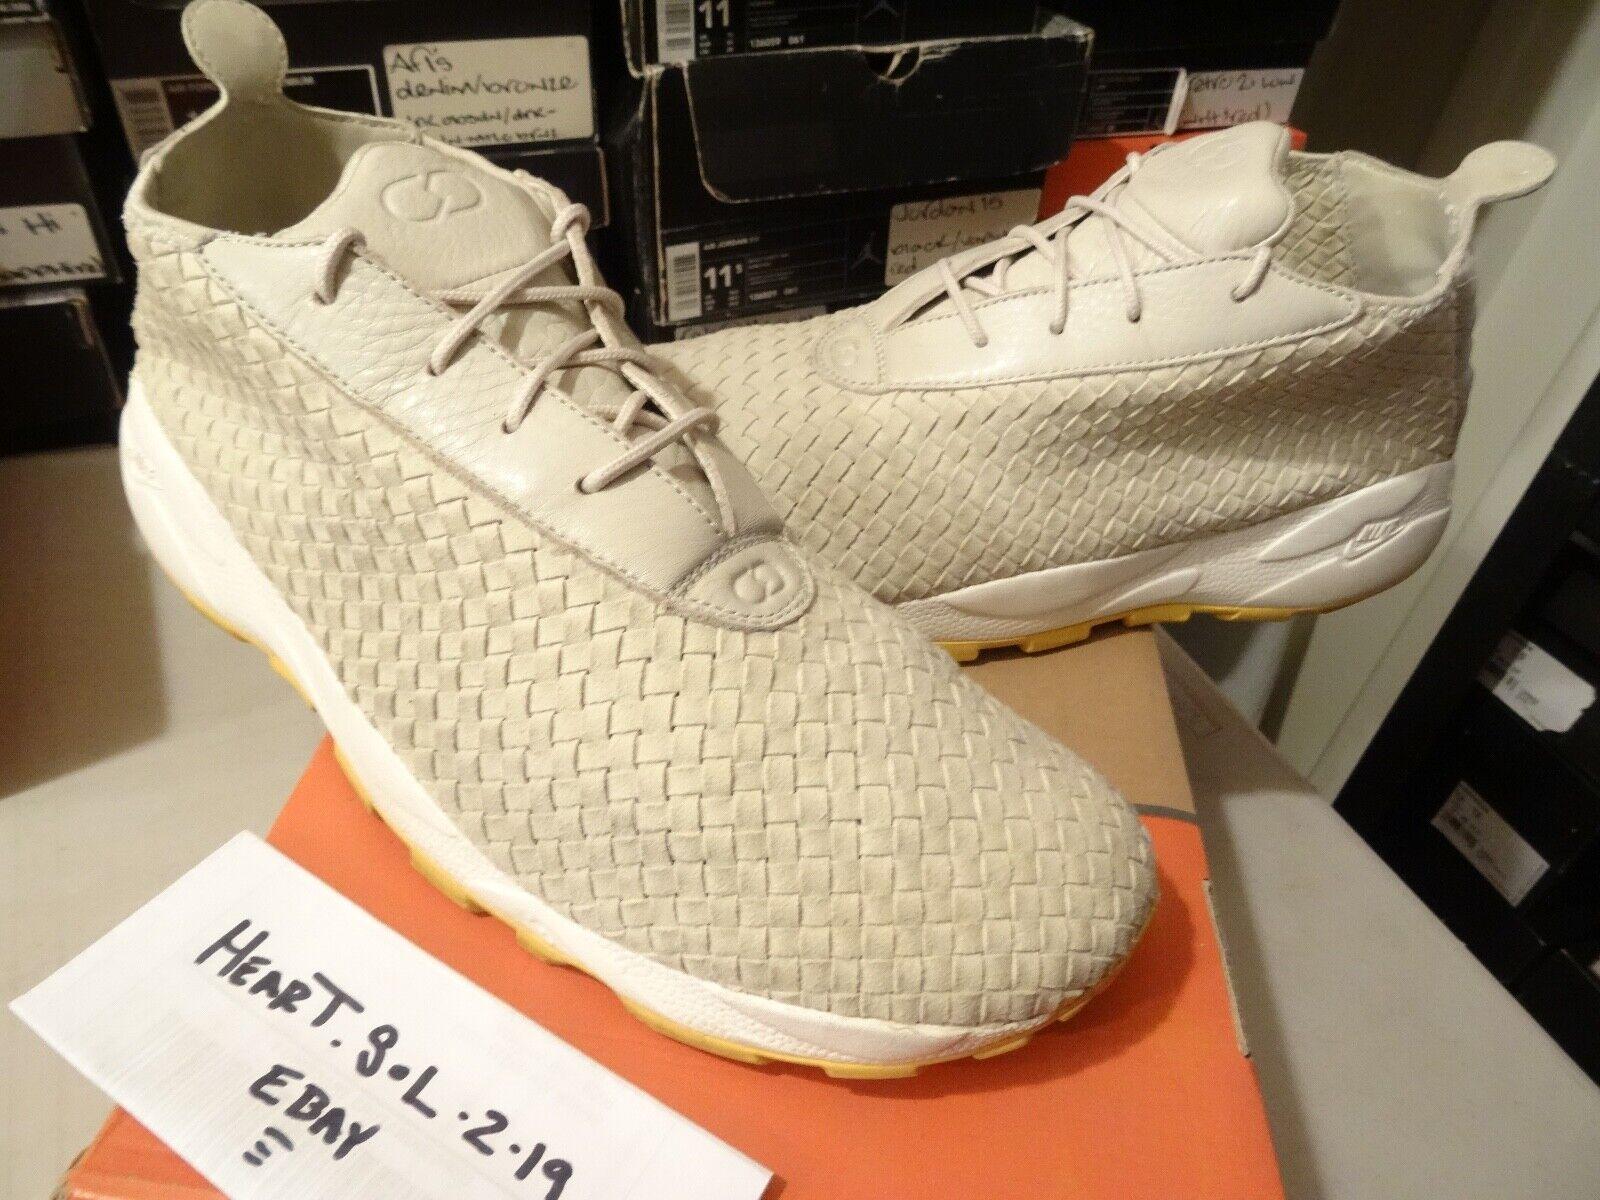 Nike Air Footscape Woven Chukka Fragment 315097 223 SZ 13 SB 360 max 90 infrared